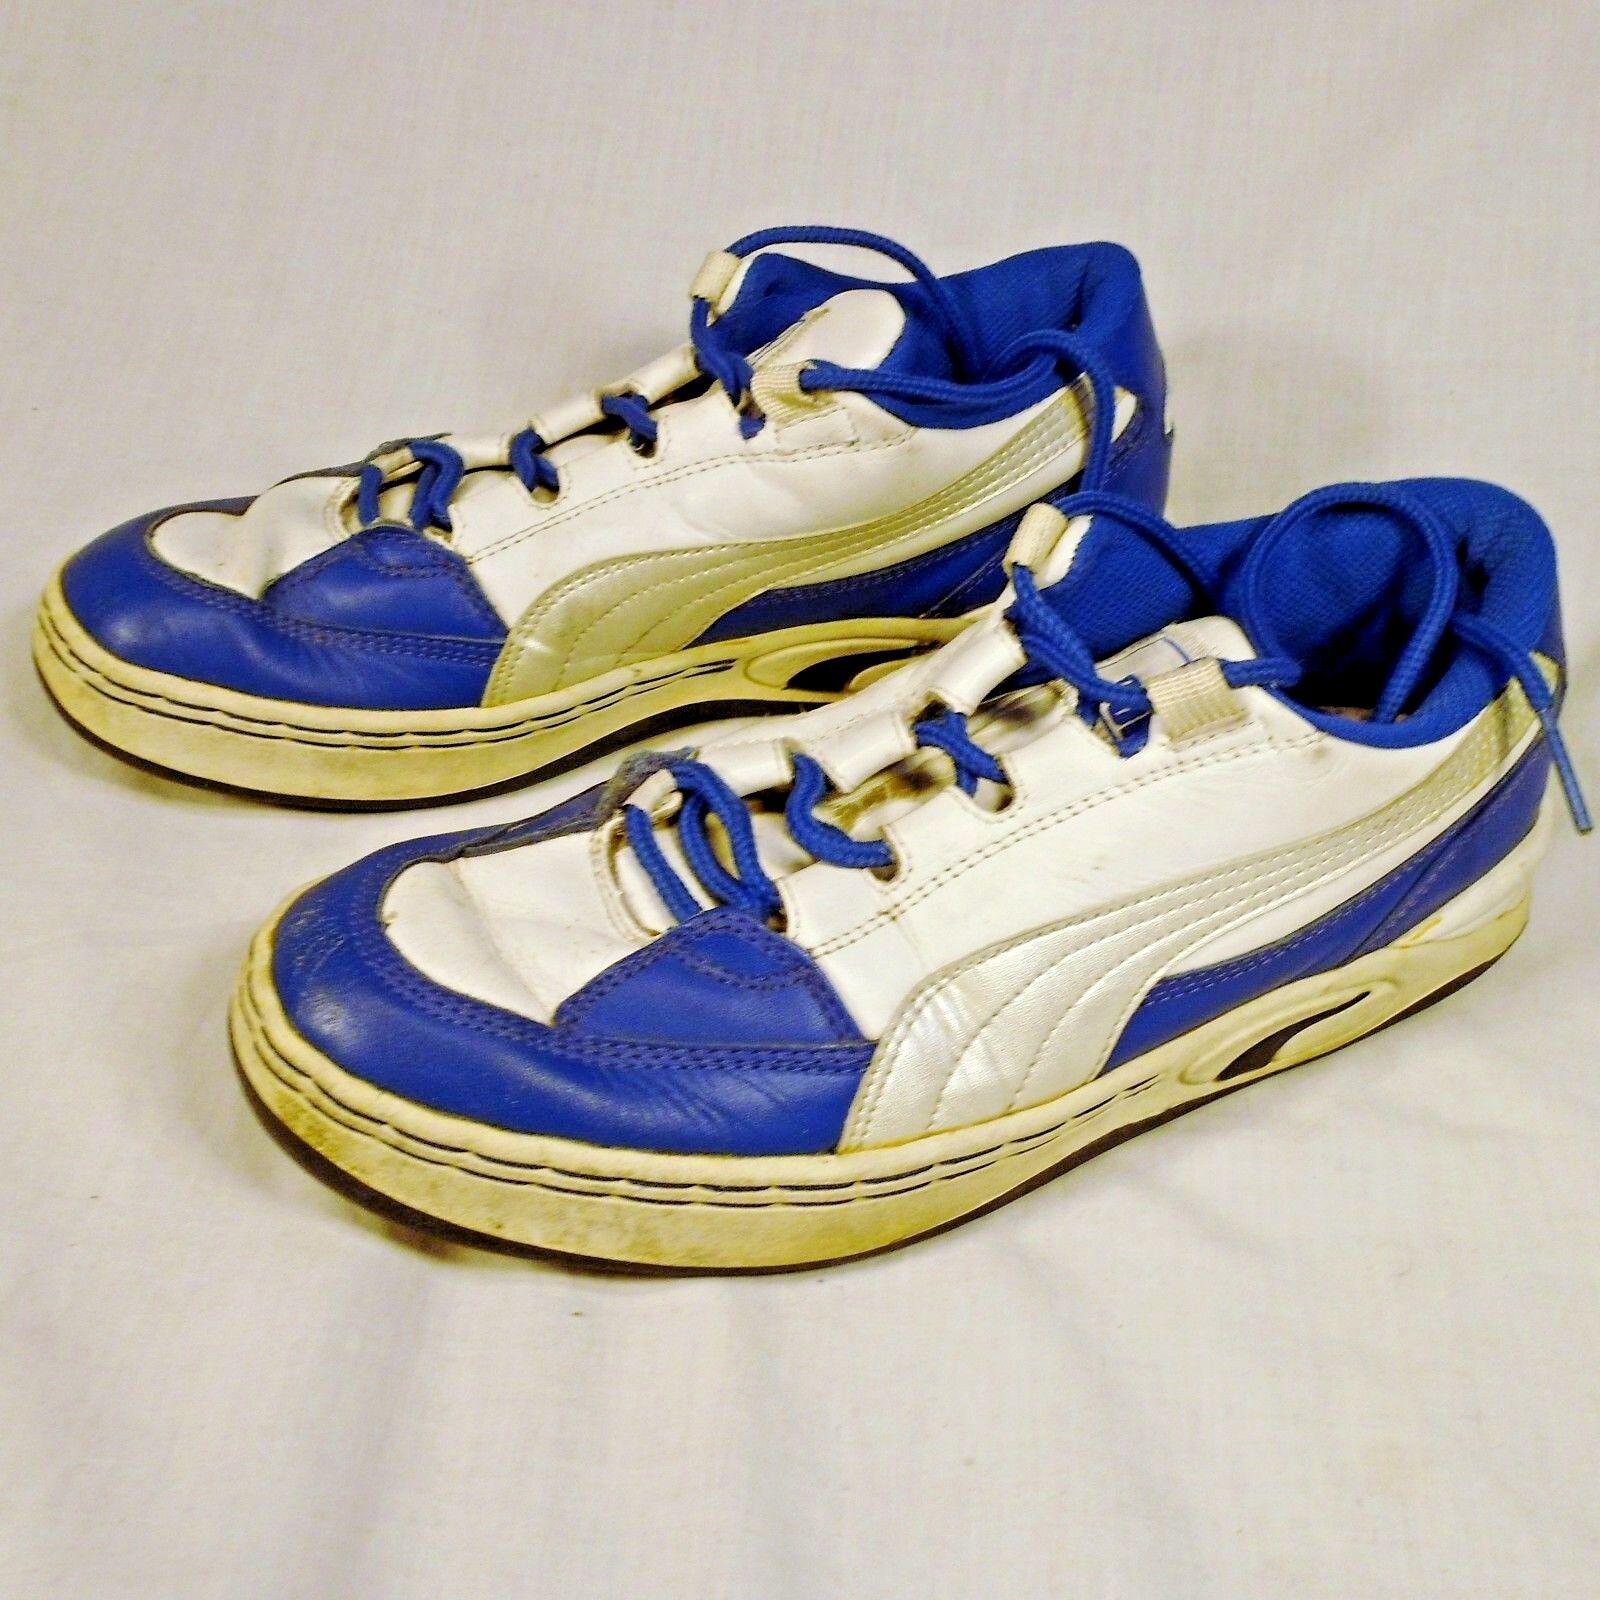 Puma Running Shoes White Blue Size 8 Athletic 341540 01 Athletic